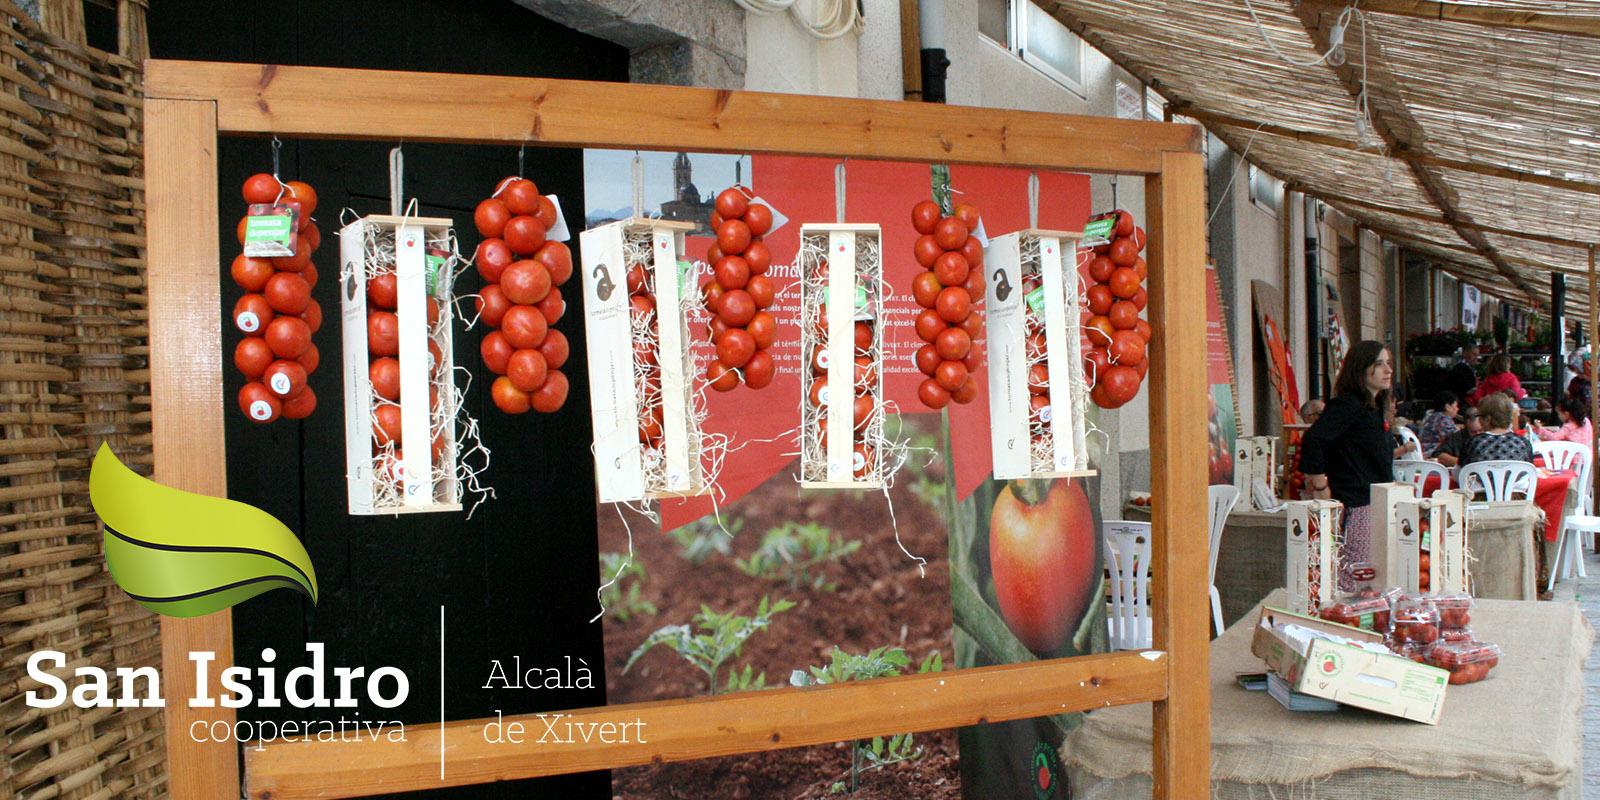 cooperativa_agricola_san_isidro_alcala_de_xivert